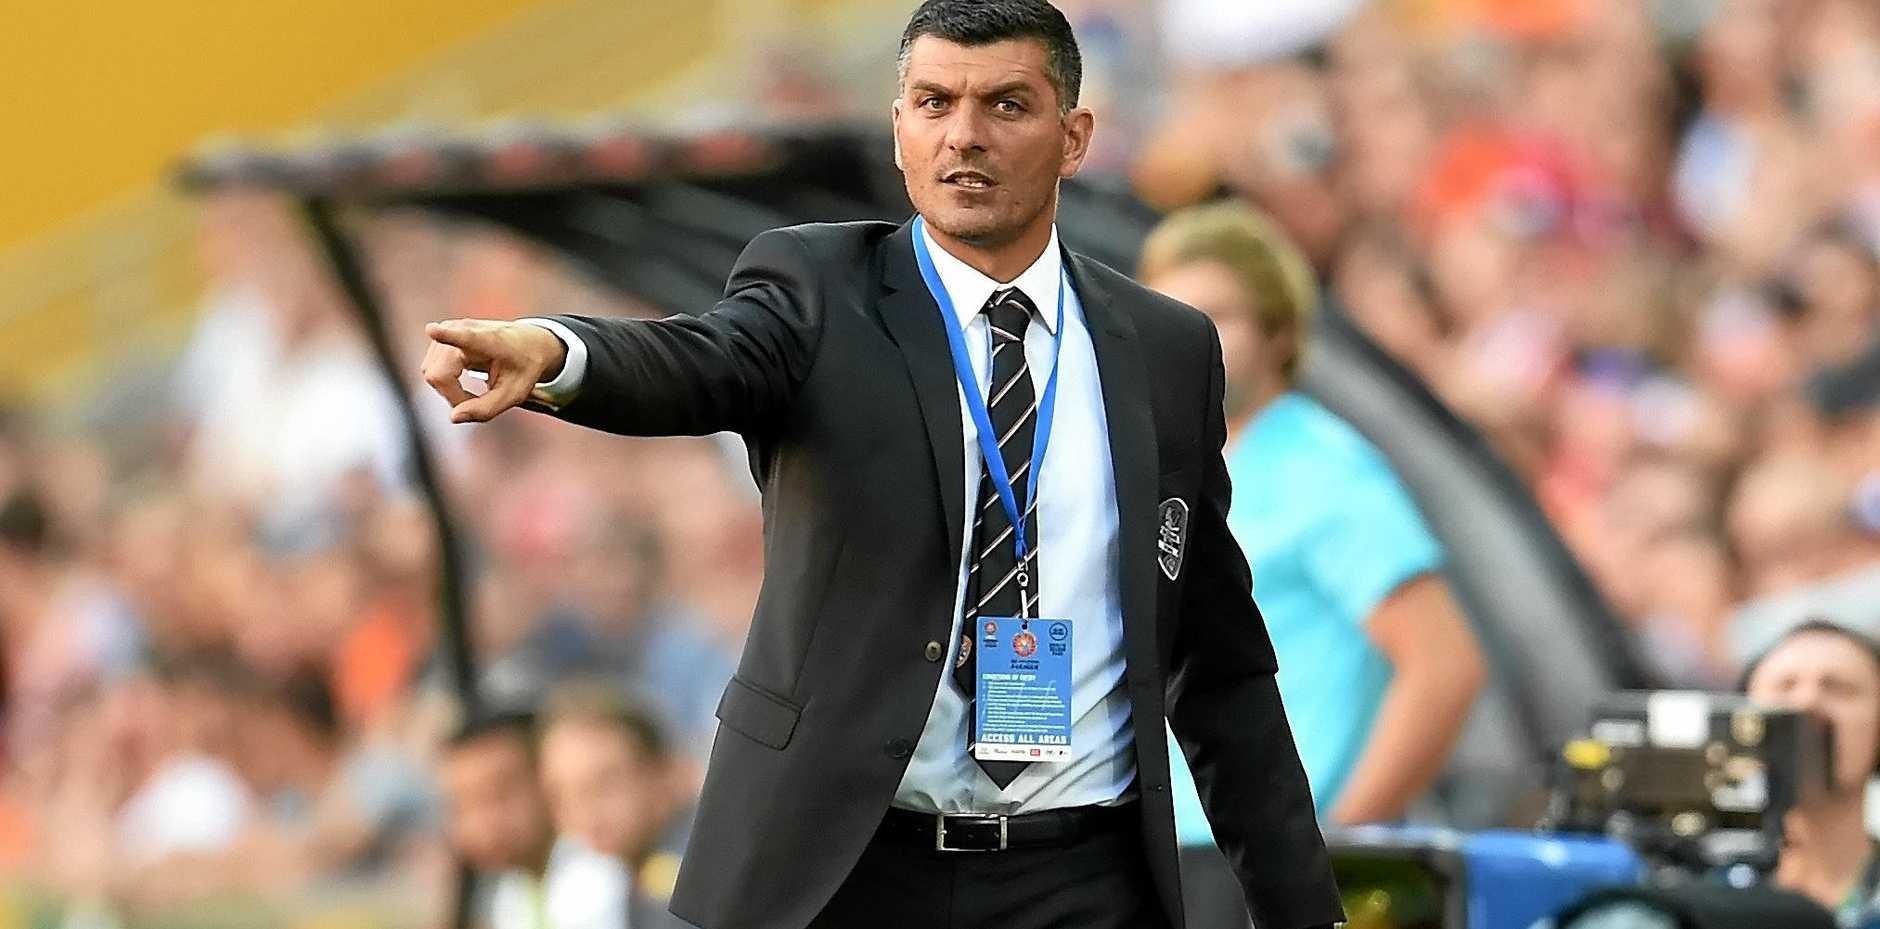 Brisbane Roar head coach John Aloisi is busy preparing his side for the new A-League season.